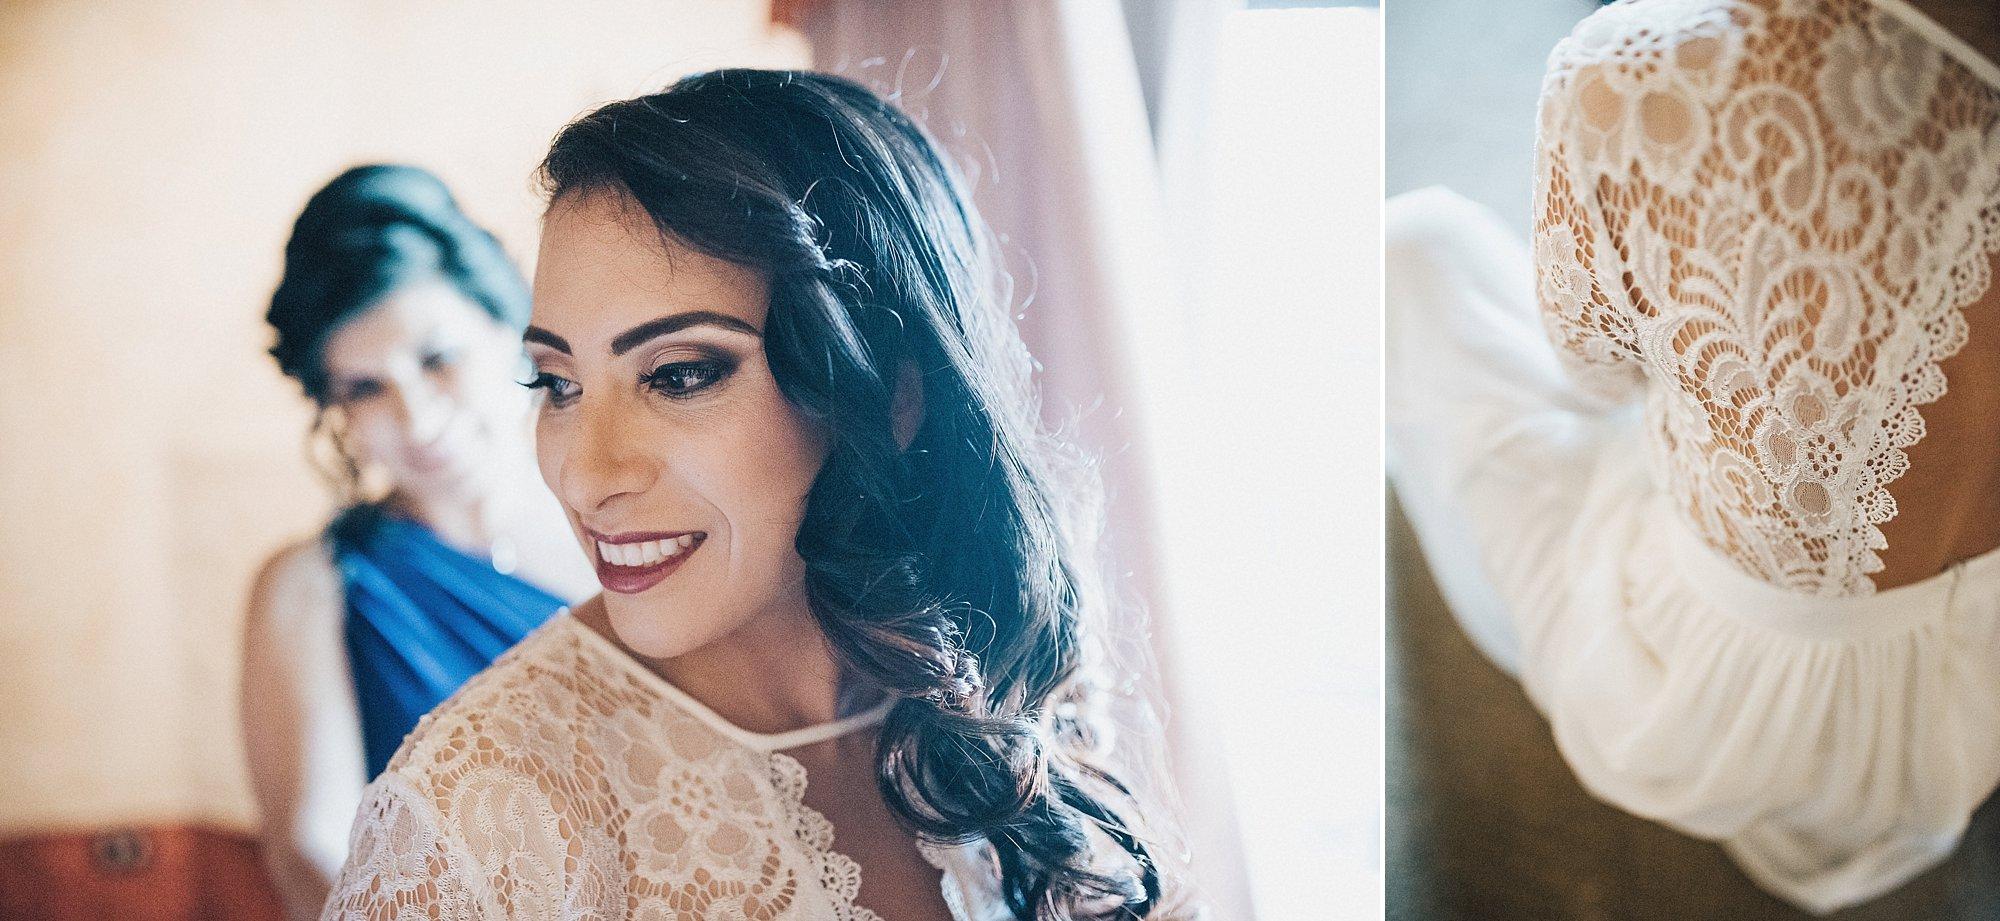 alex-yazmin-wedding-photographer-antigua-guatemala-058